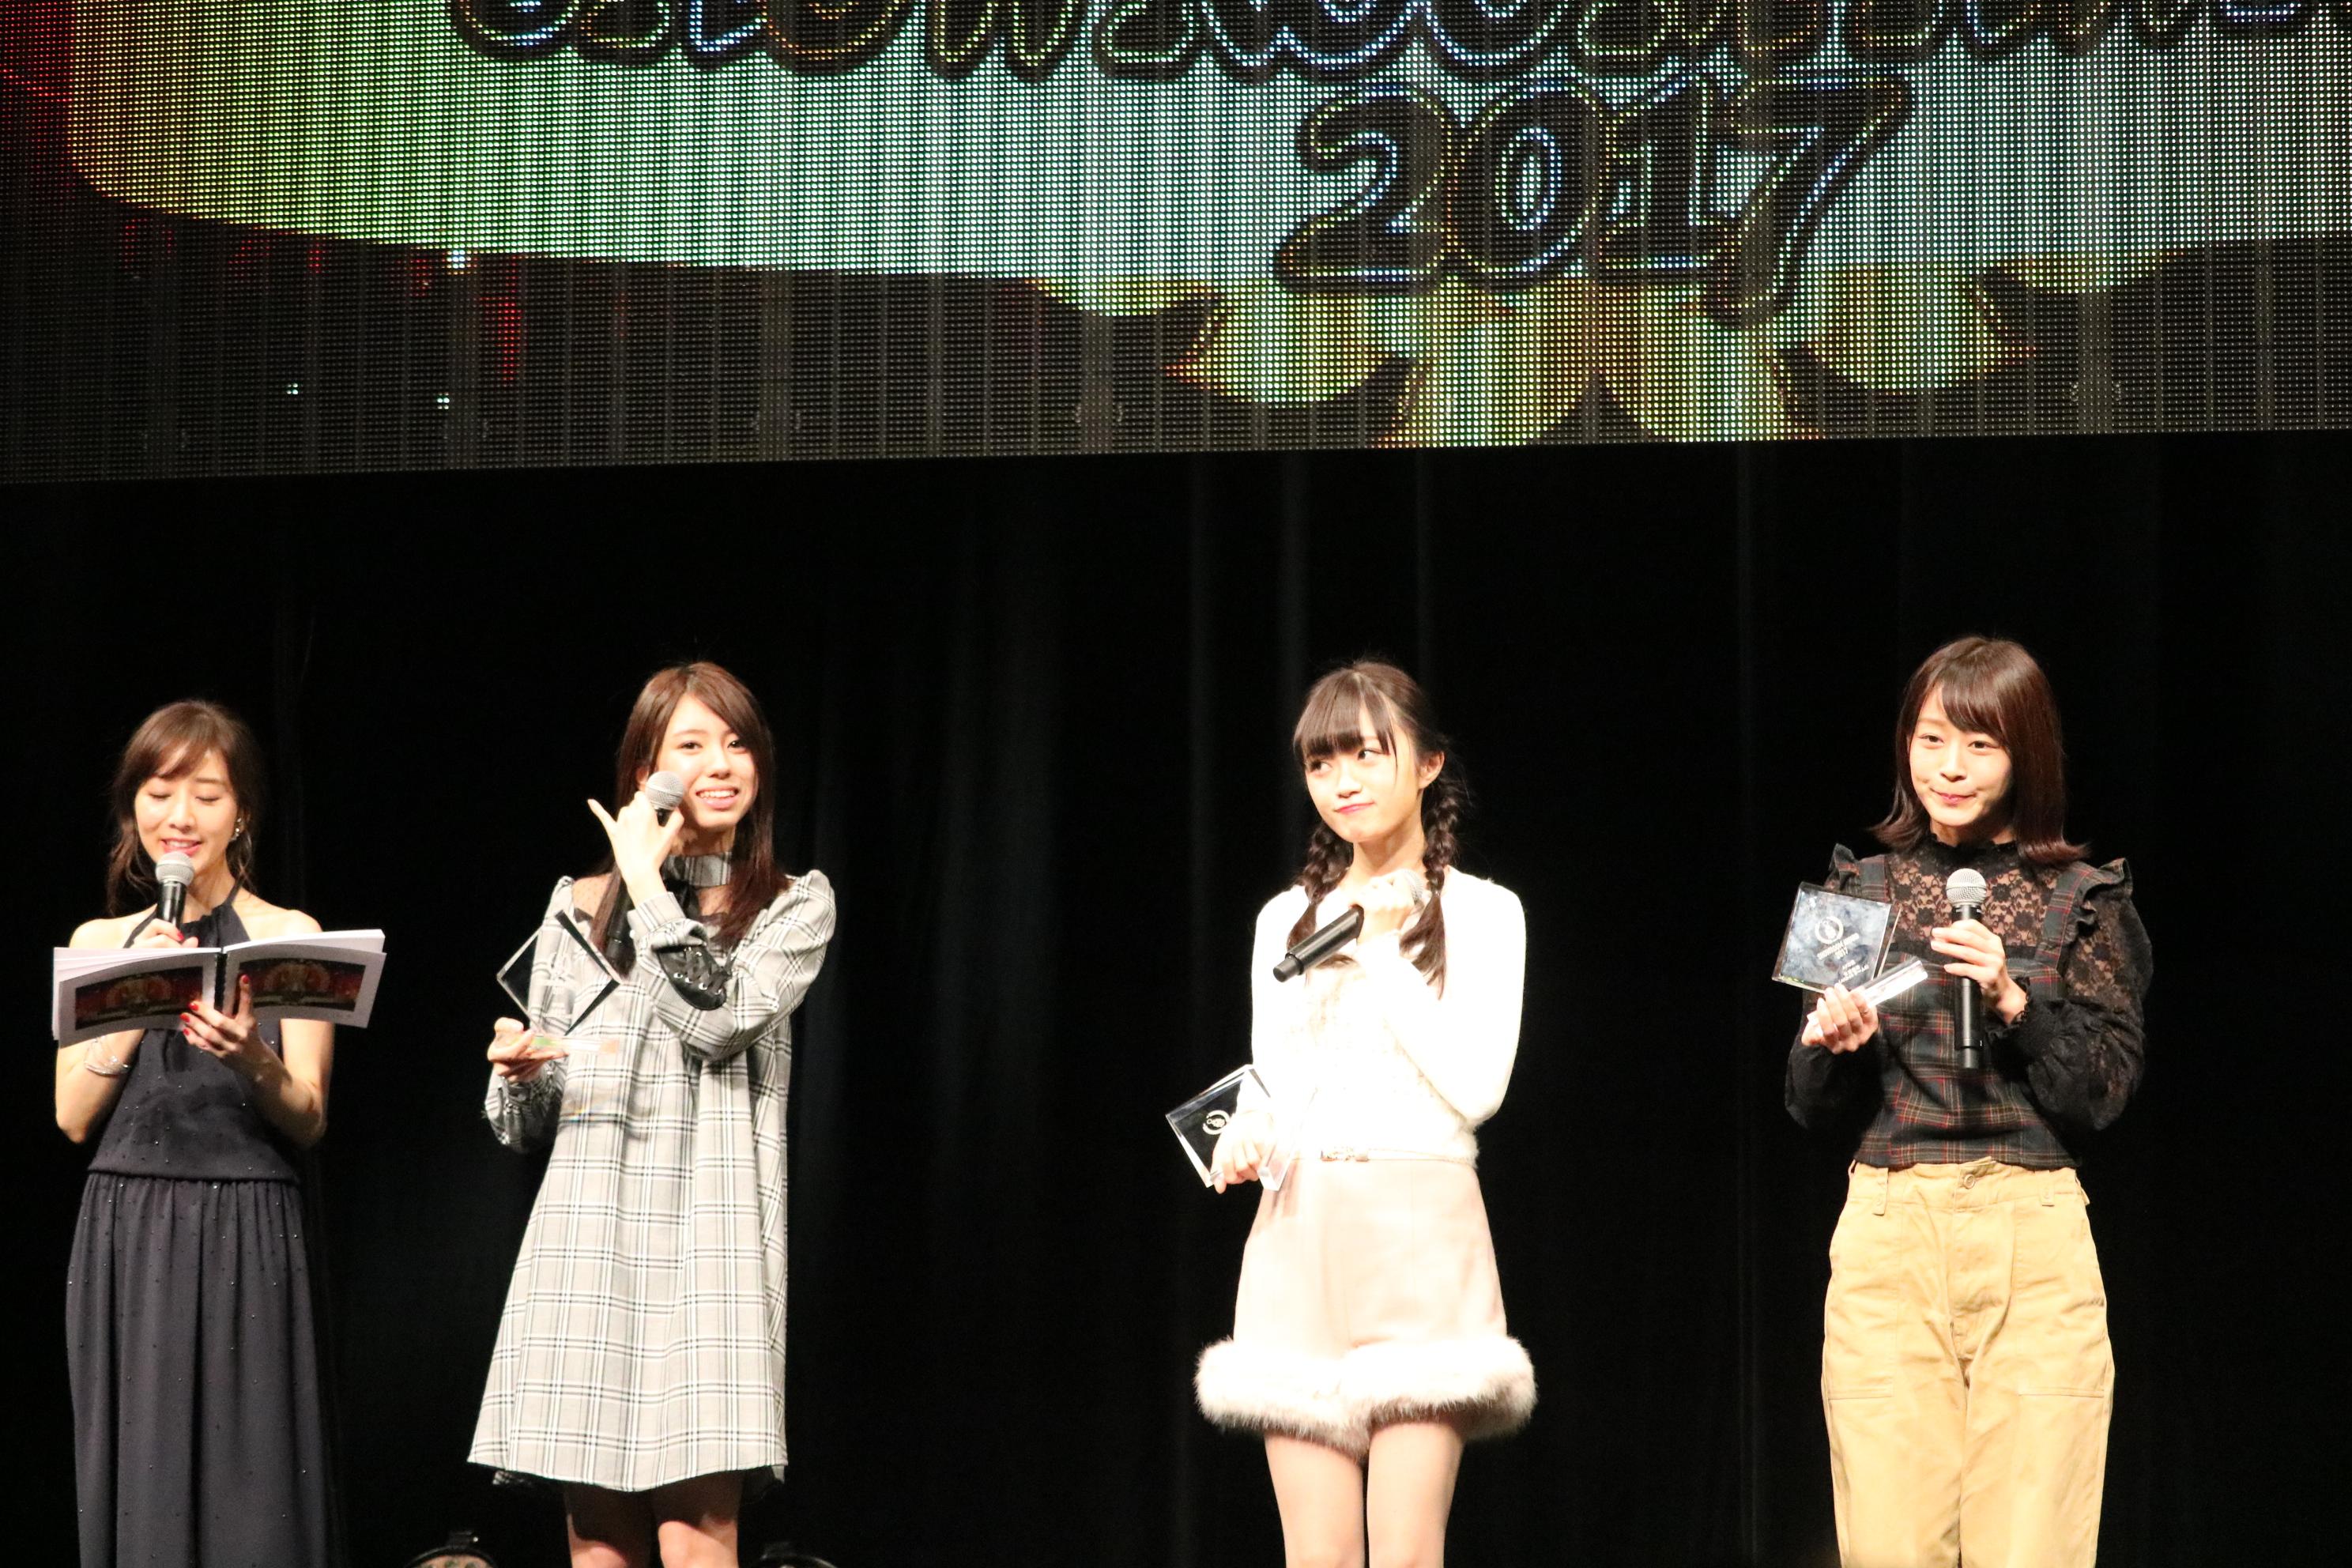 SHOWROOMアワード2017でAKB賞を受賞。右から太田奈緒、中井りか、大西桃香